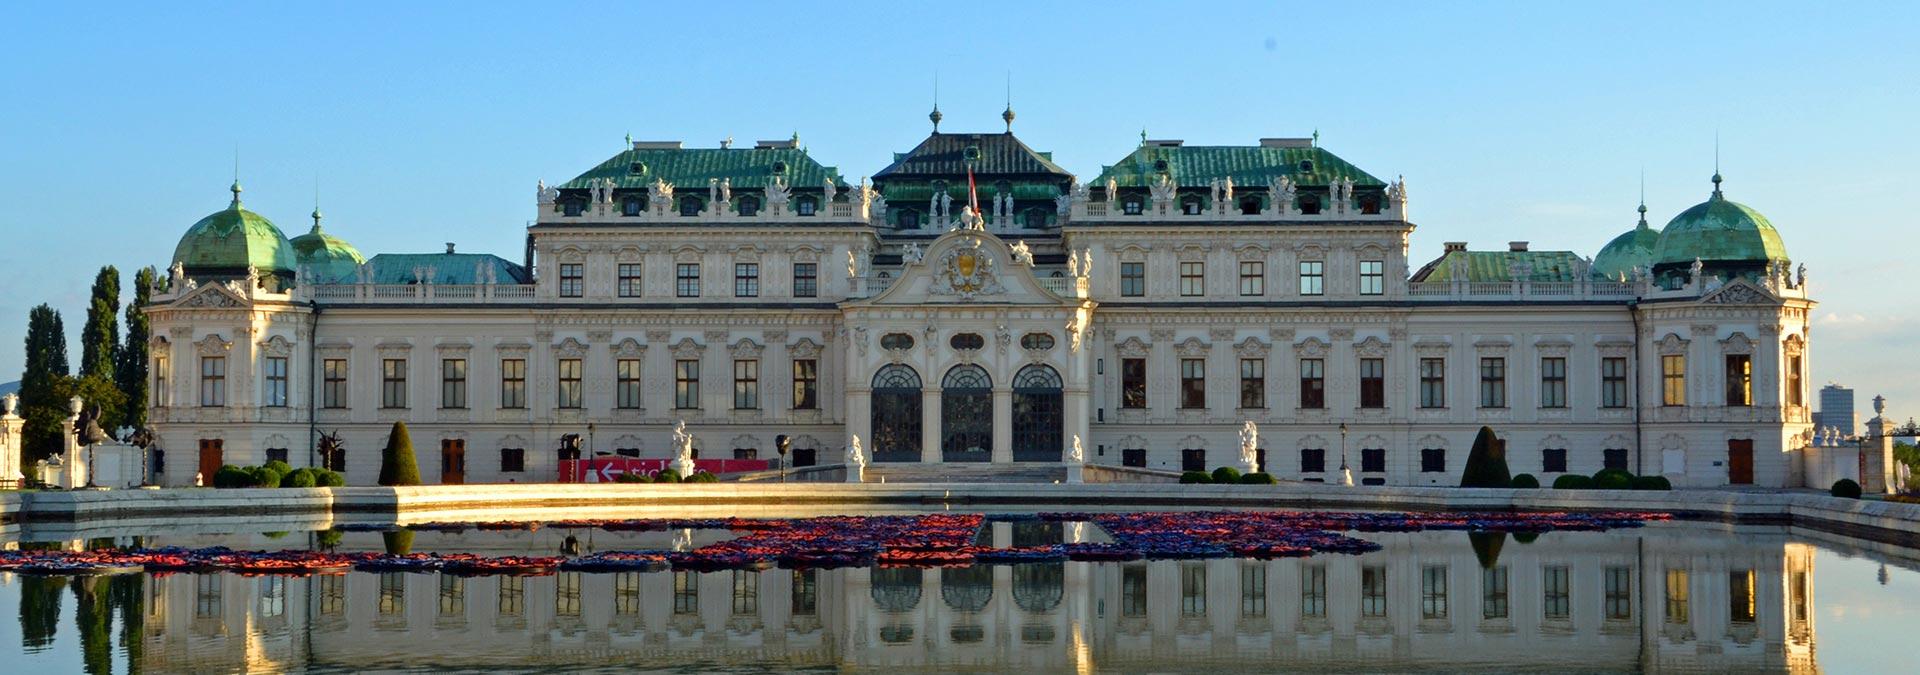 Tour from Vienna to Krakow - Austria, Slovakia, Poland - Vienna, Bratislava, Krakow, Slovakia Travel, Location